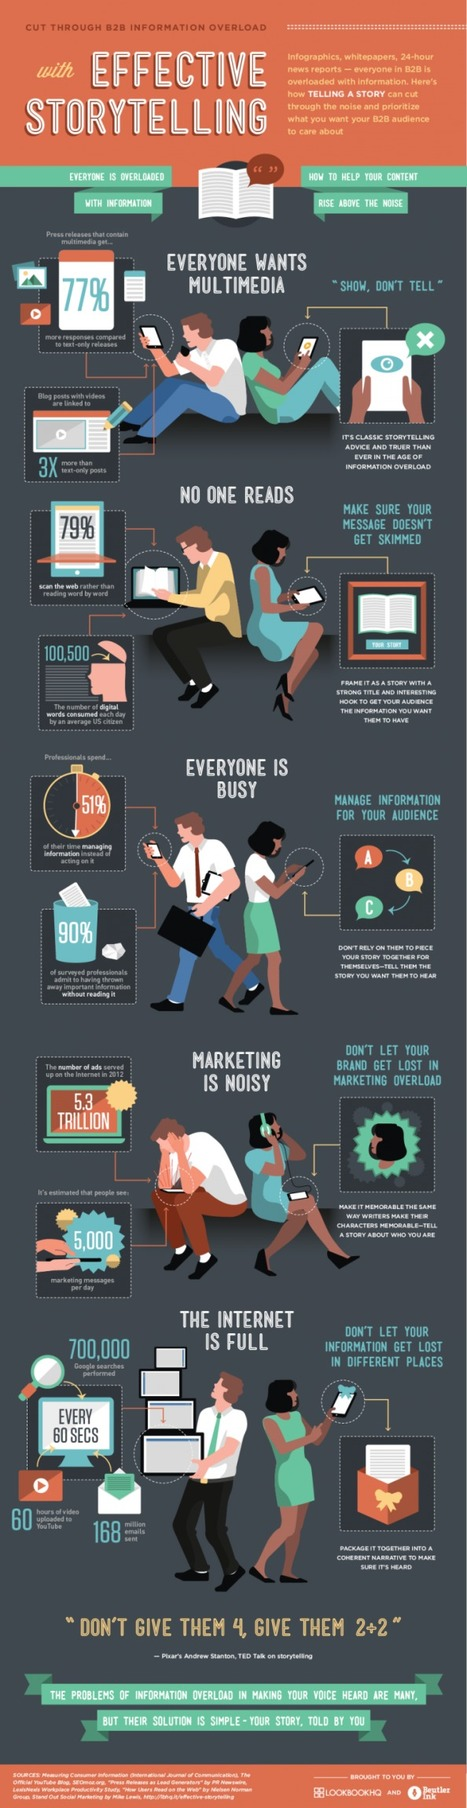 Effective Storytelling for B2B | Pinterest | #TheMarketingAutomationAlert | social media | Scoop.it